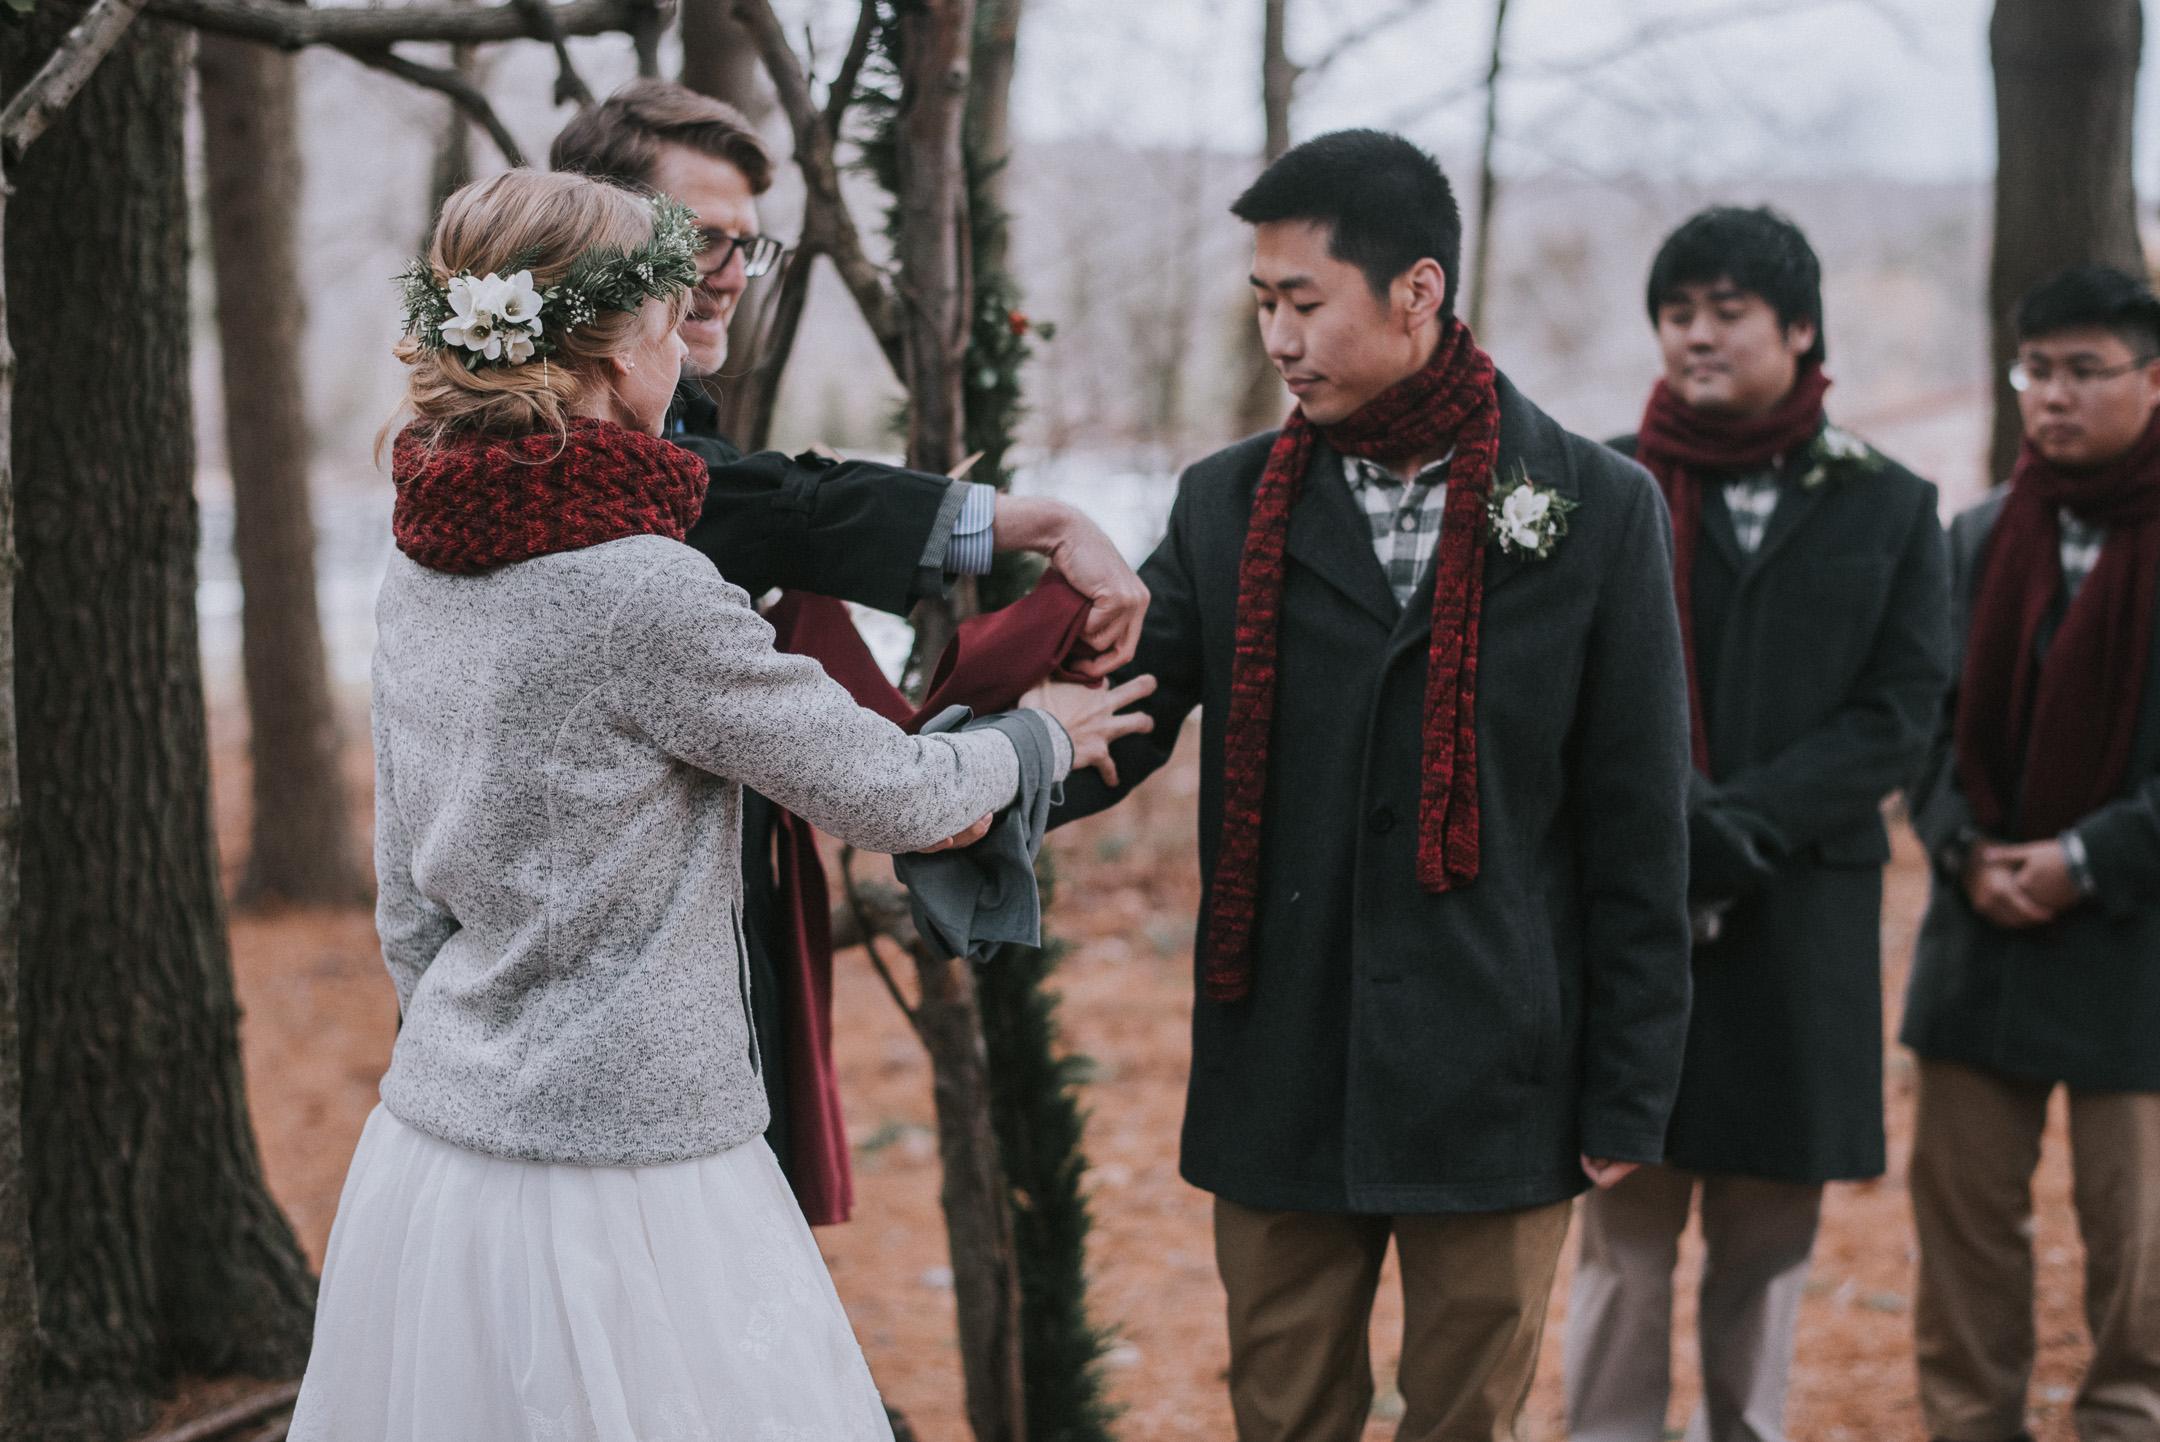 thurmont wedding photographer (25 of 38).jpg